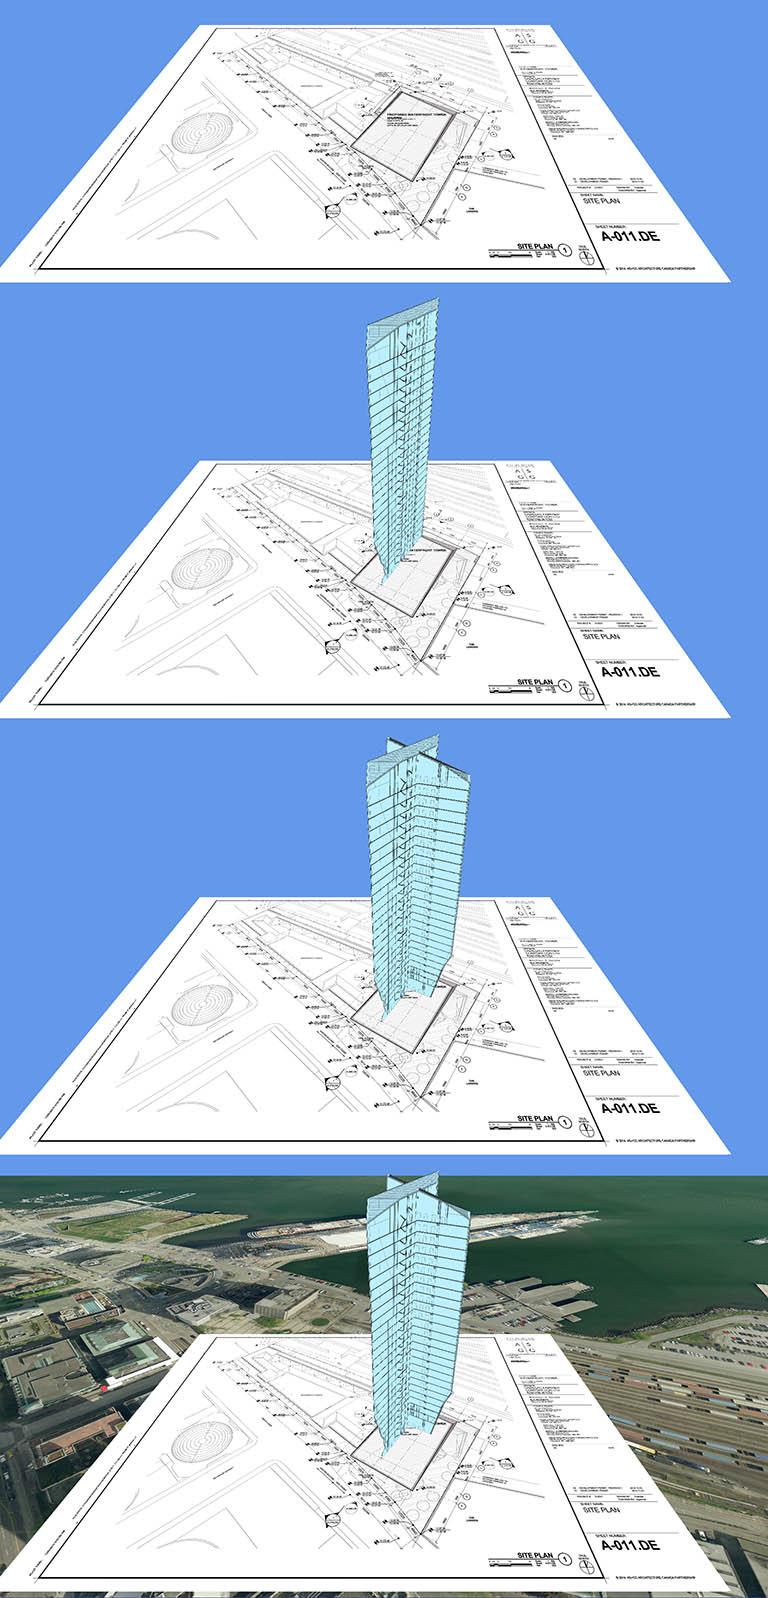 Drawings overlay steps